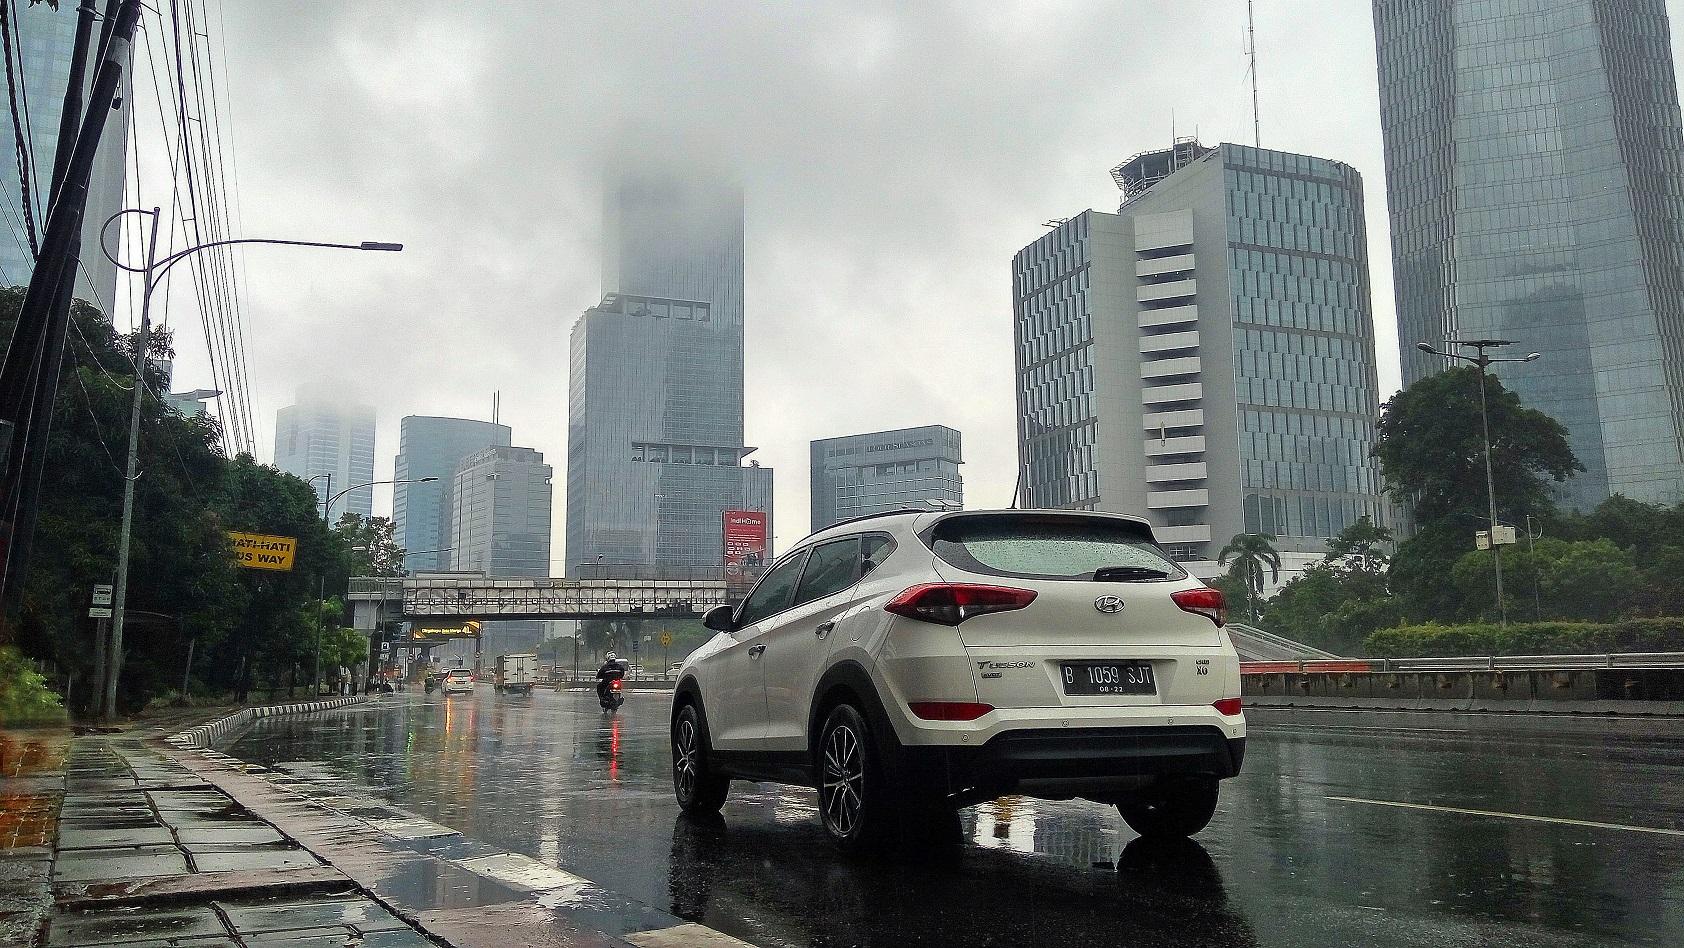 Bawaan Wajib di Mobil Saat Musim Hujan